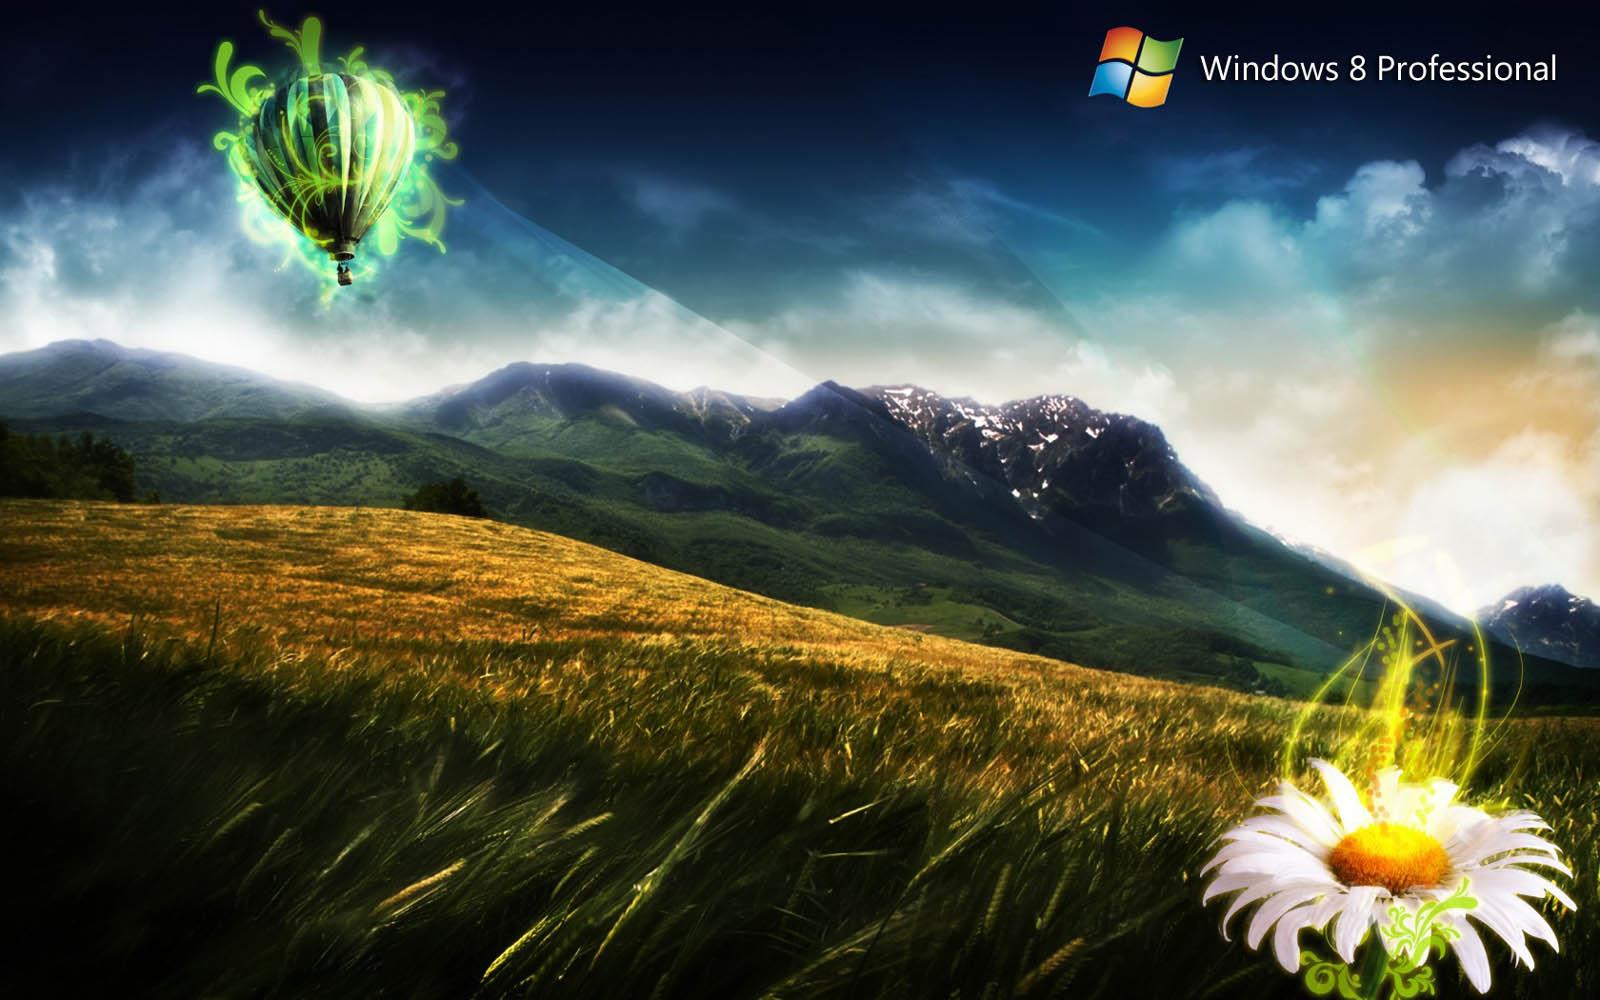 wallpaper: Windows 8 Desktop Wallpapers and Backgrounds